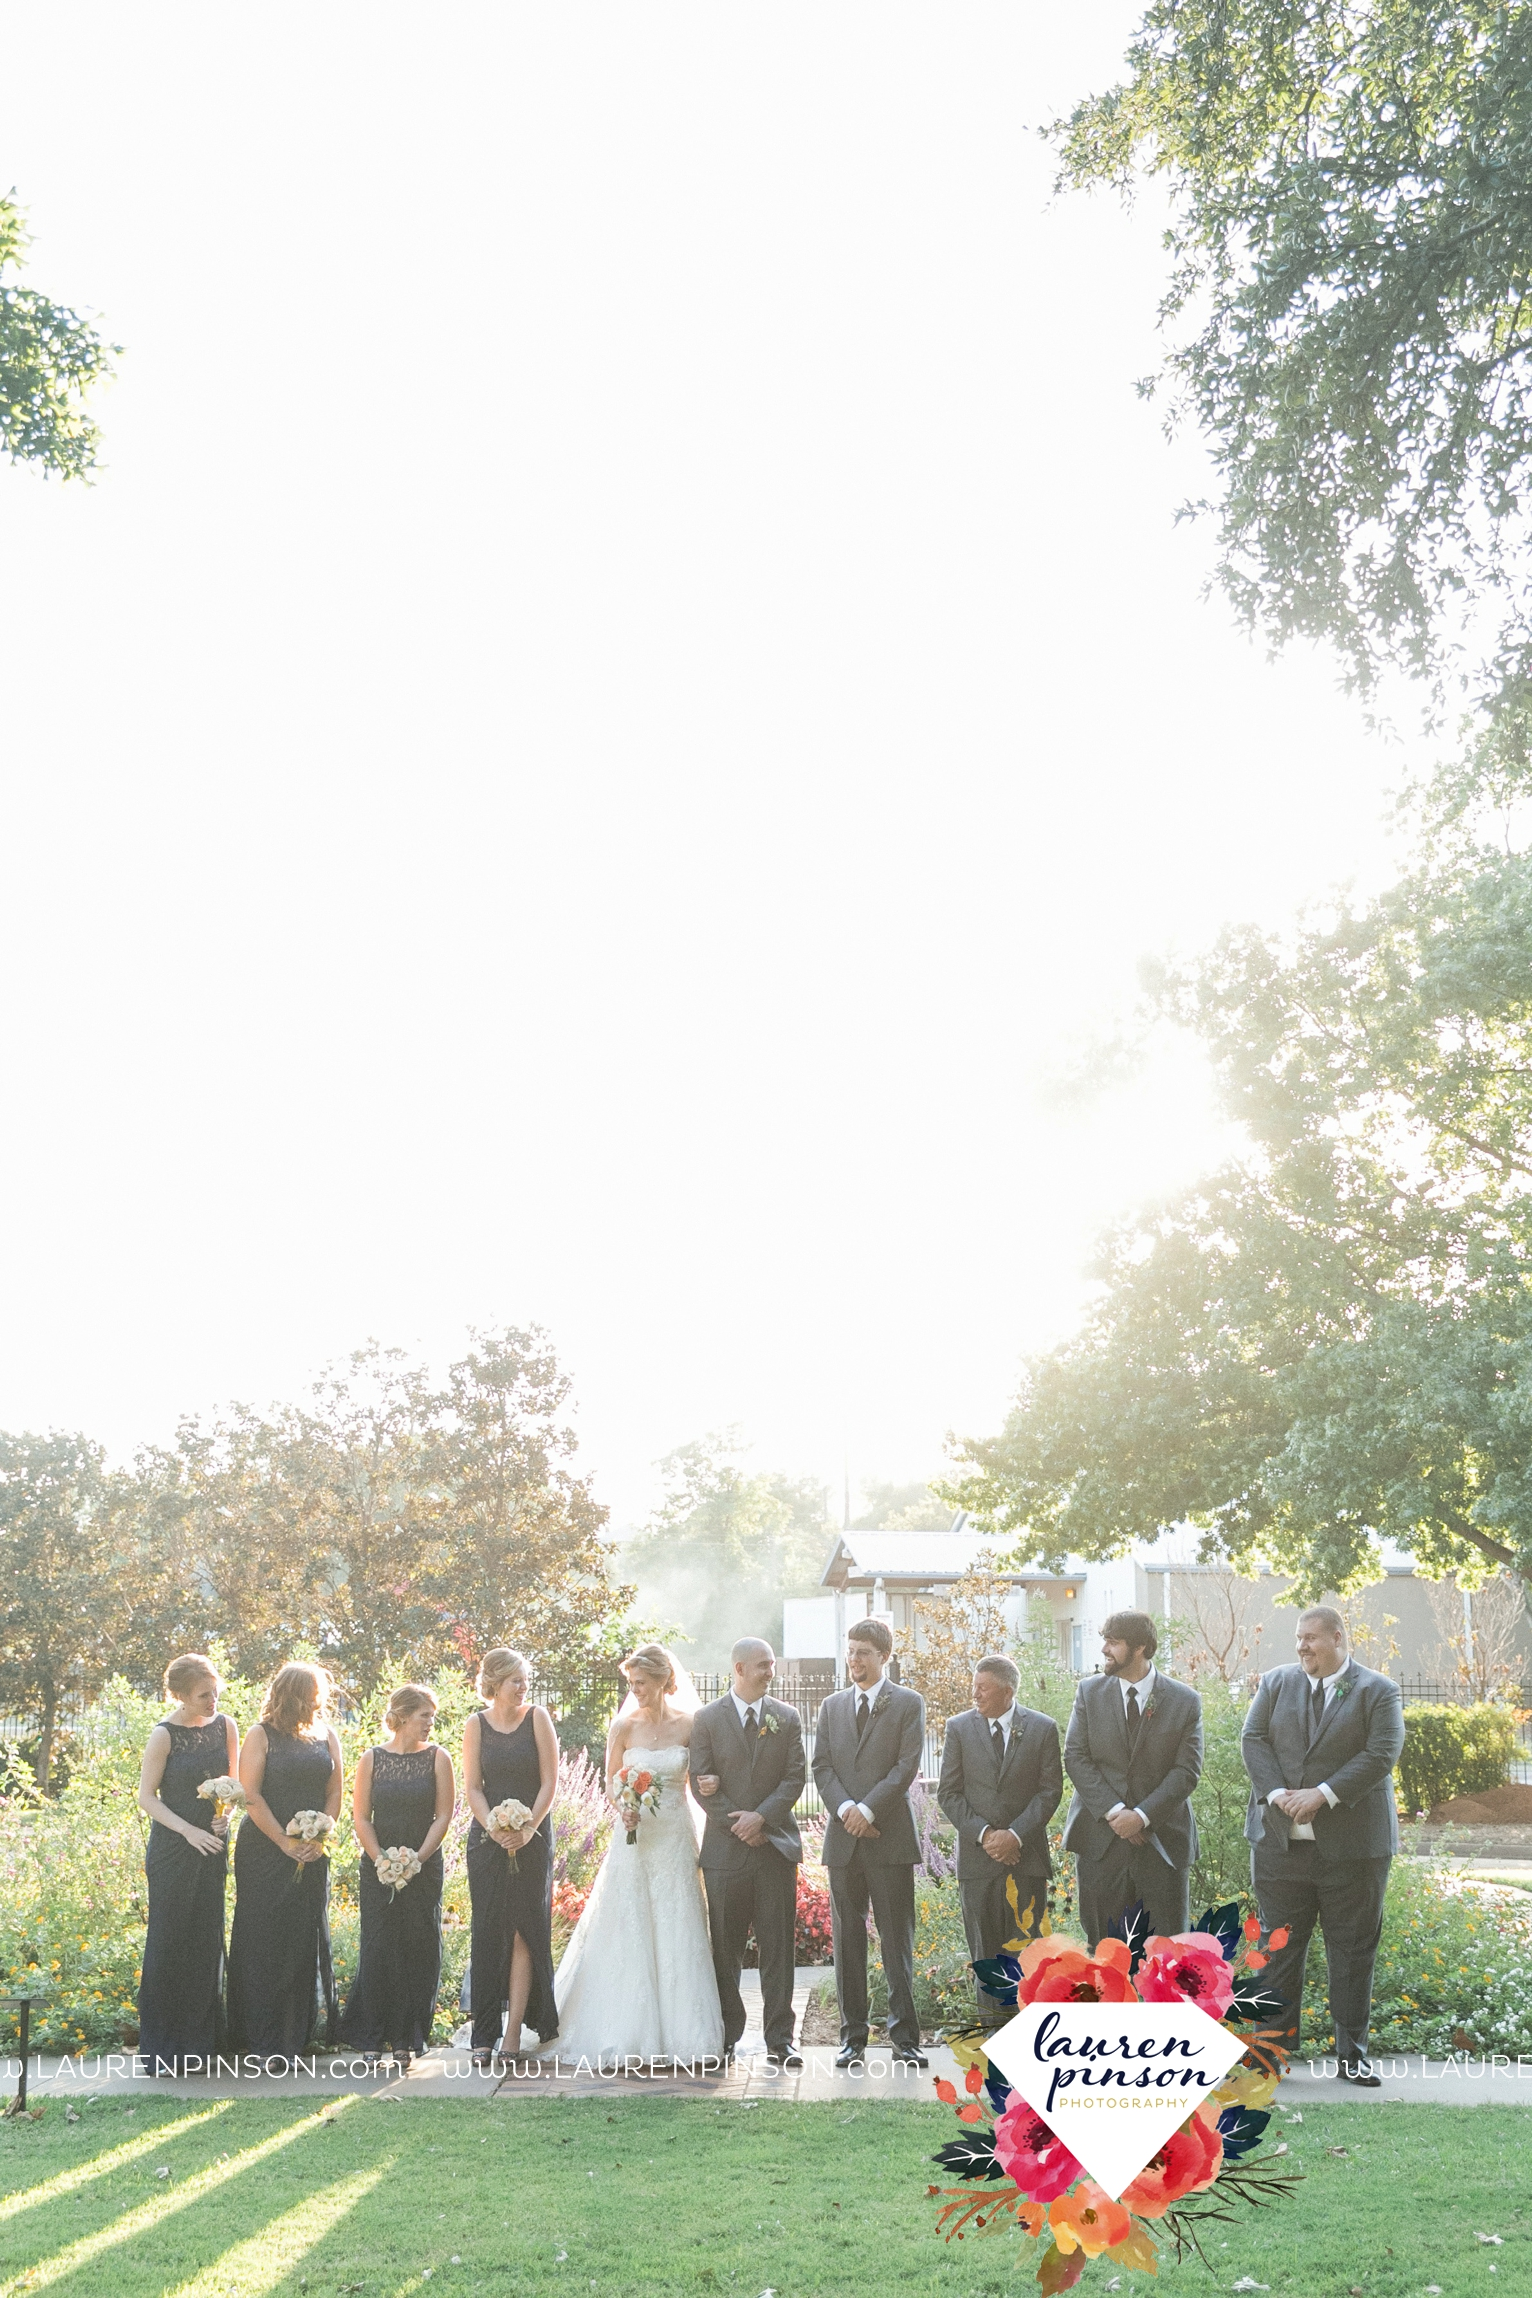 kemp-center-for-the-arts-wichita-falls-texas-wedding-photographer-fall-wedding-pumpkins-175.jpg